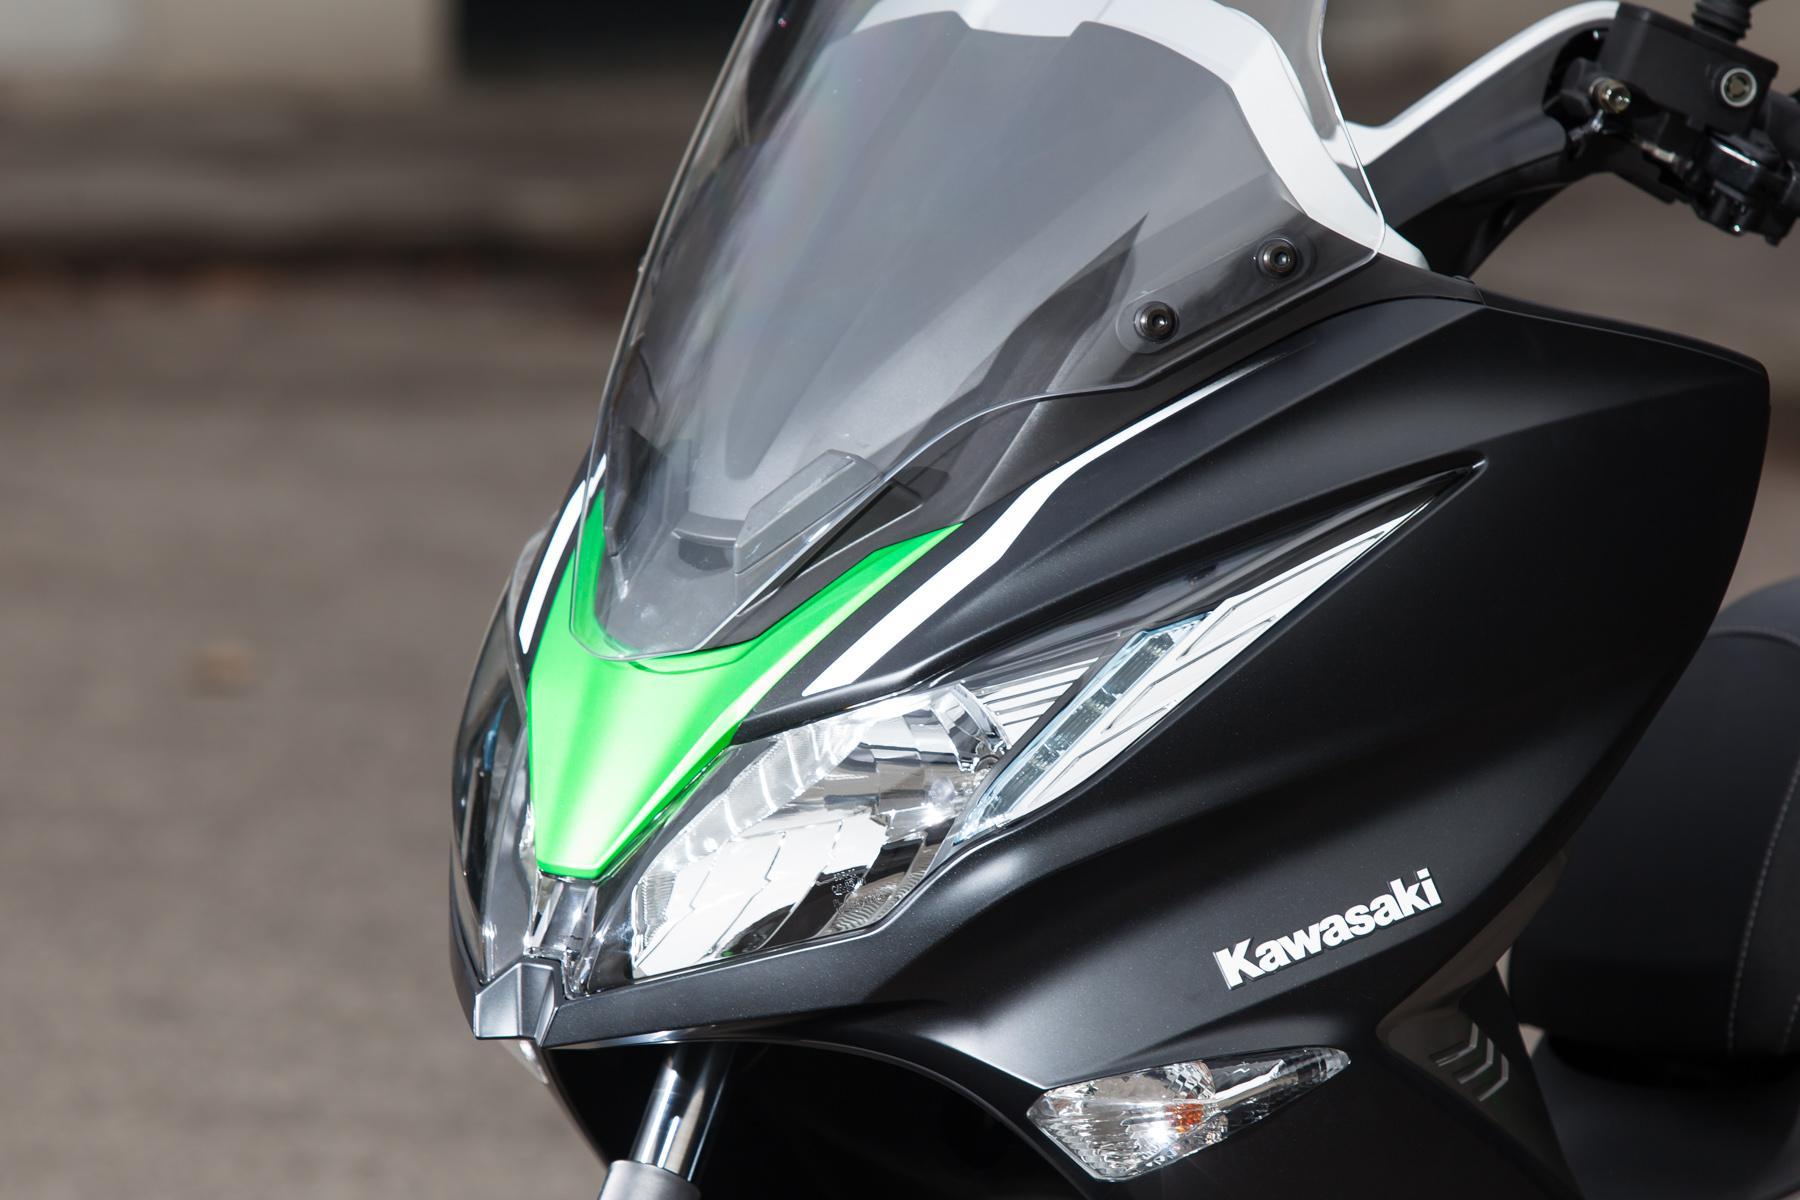 http://www.motorrad-bilder.at/slideshows/291/010647/kawasaki_j300_roller-1.jpg